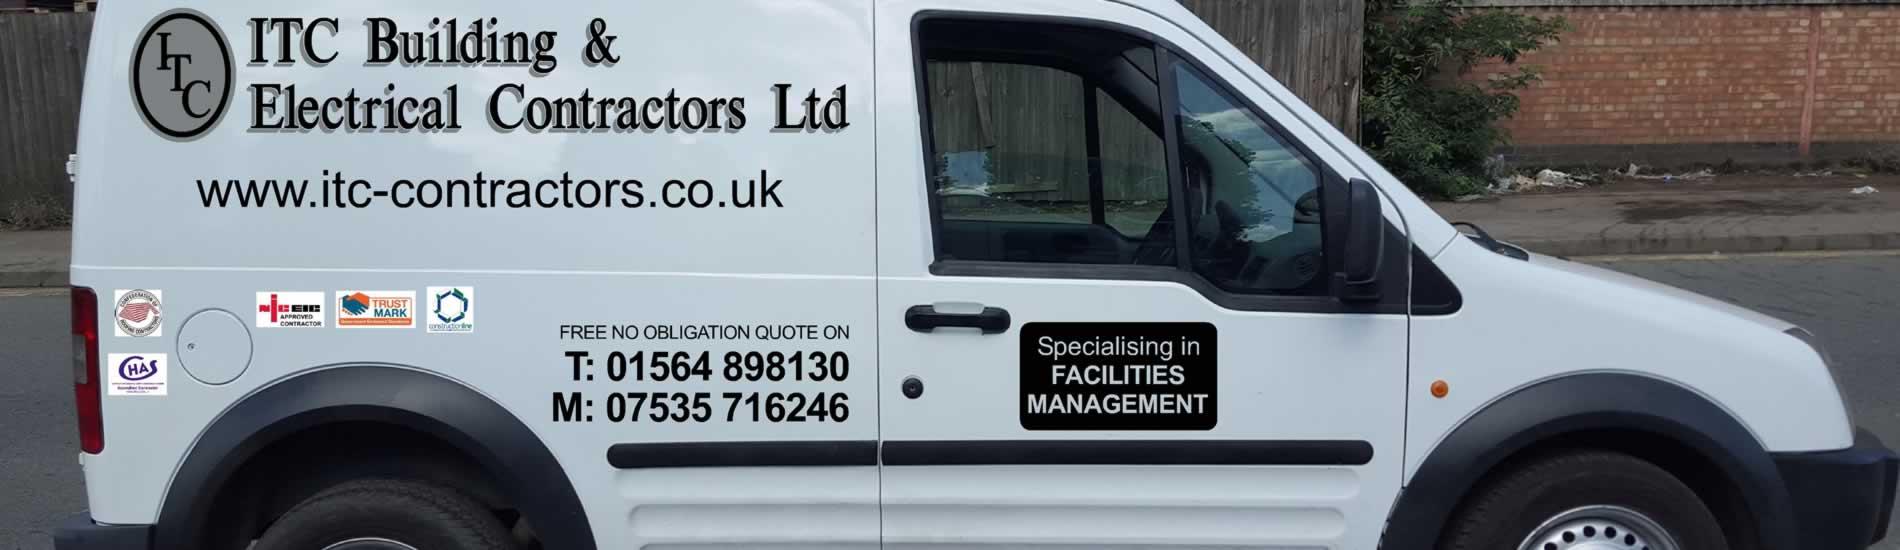 ITC-Electrical-Contractors-SLIDER